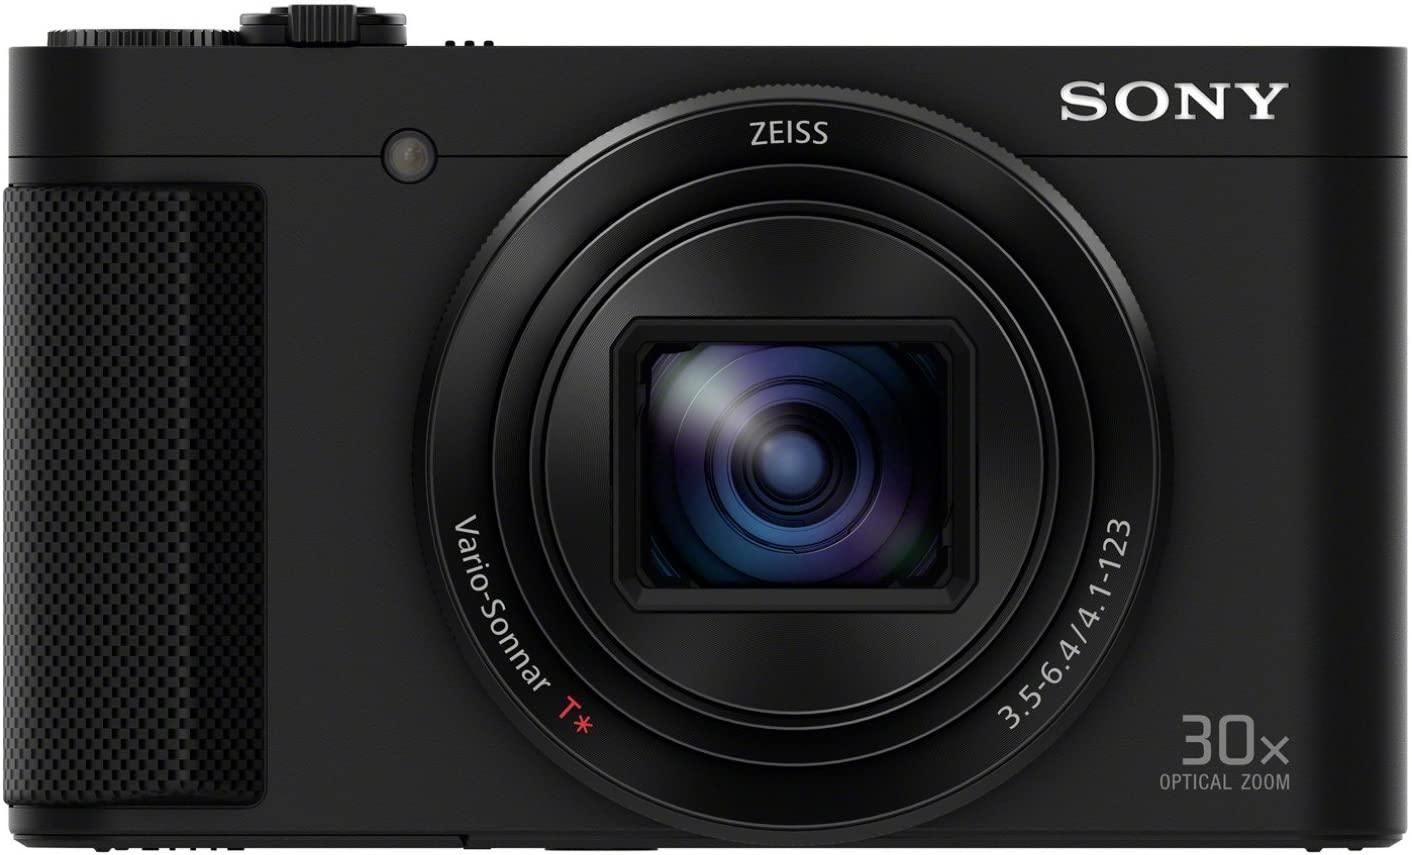 camara-compacta-digital-sony-cyber-shot-dsc-hx90.jpg